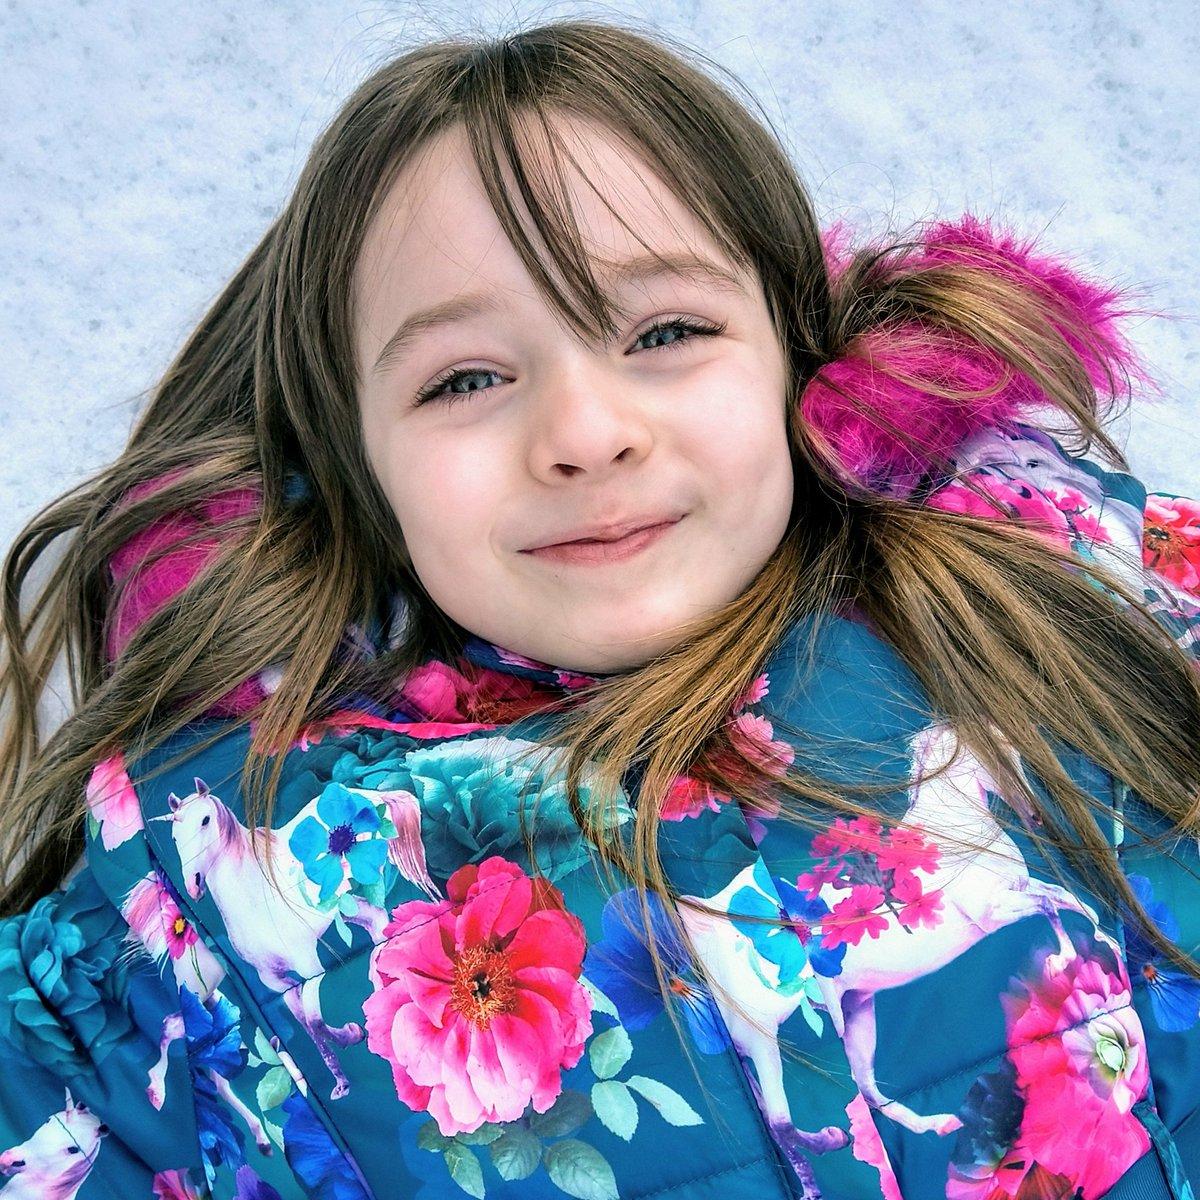 Snow Angel🥰 #uksnow #sundayvibes #snow #Snowing #SundayMorning #SundayFunday #love #family